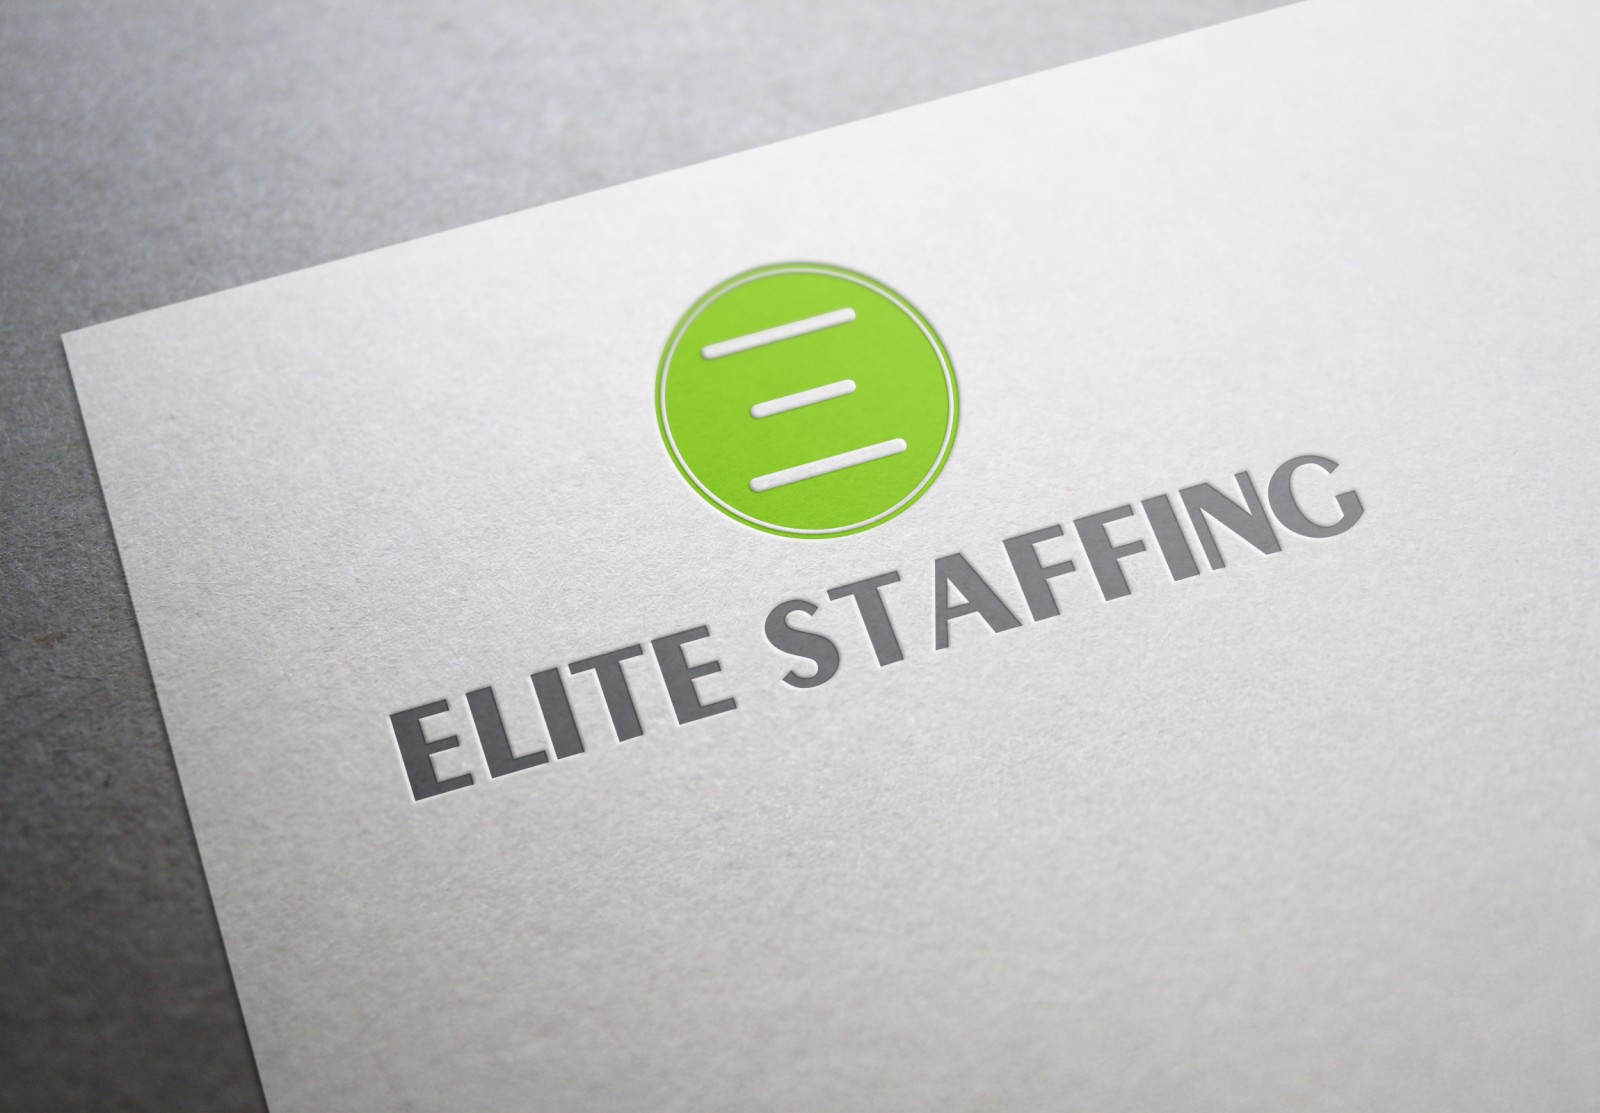 Elite Staffing Company